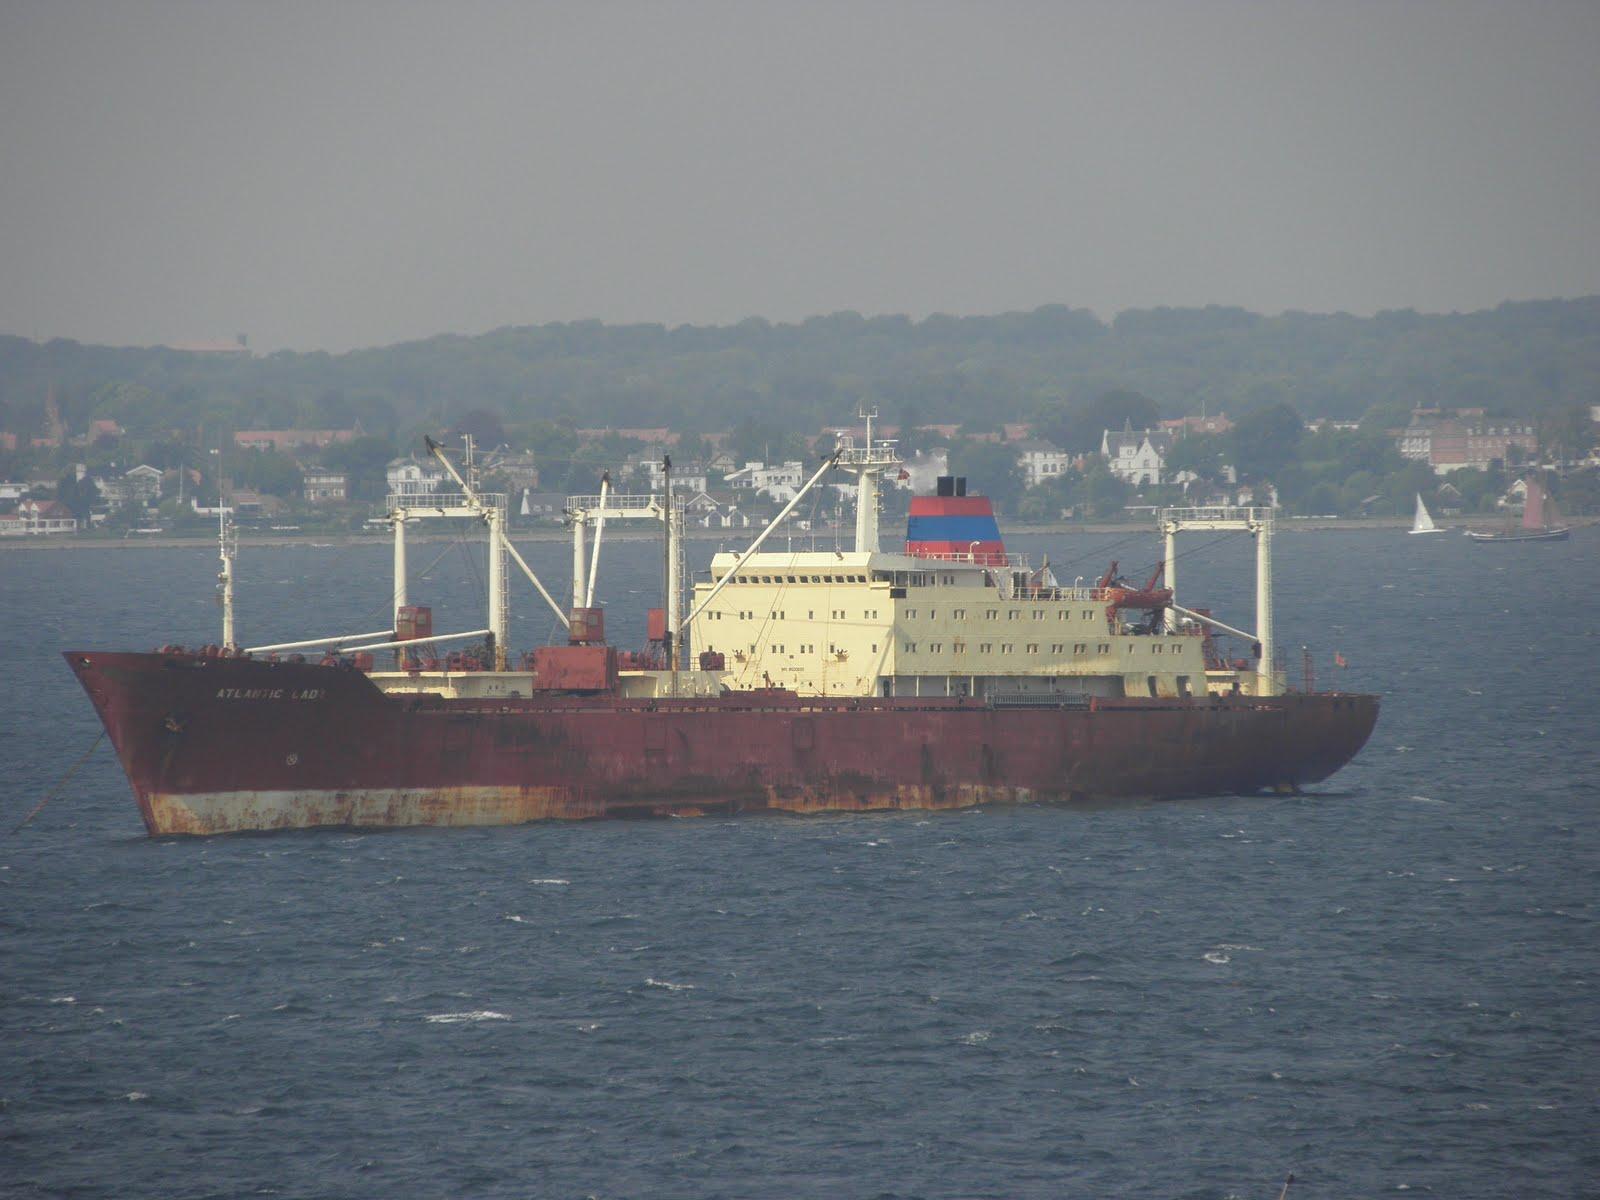 [atlantic+lady+23-07-09+kopenhagen+2.JPG]